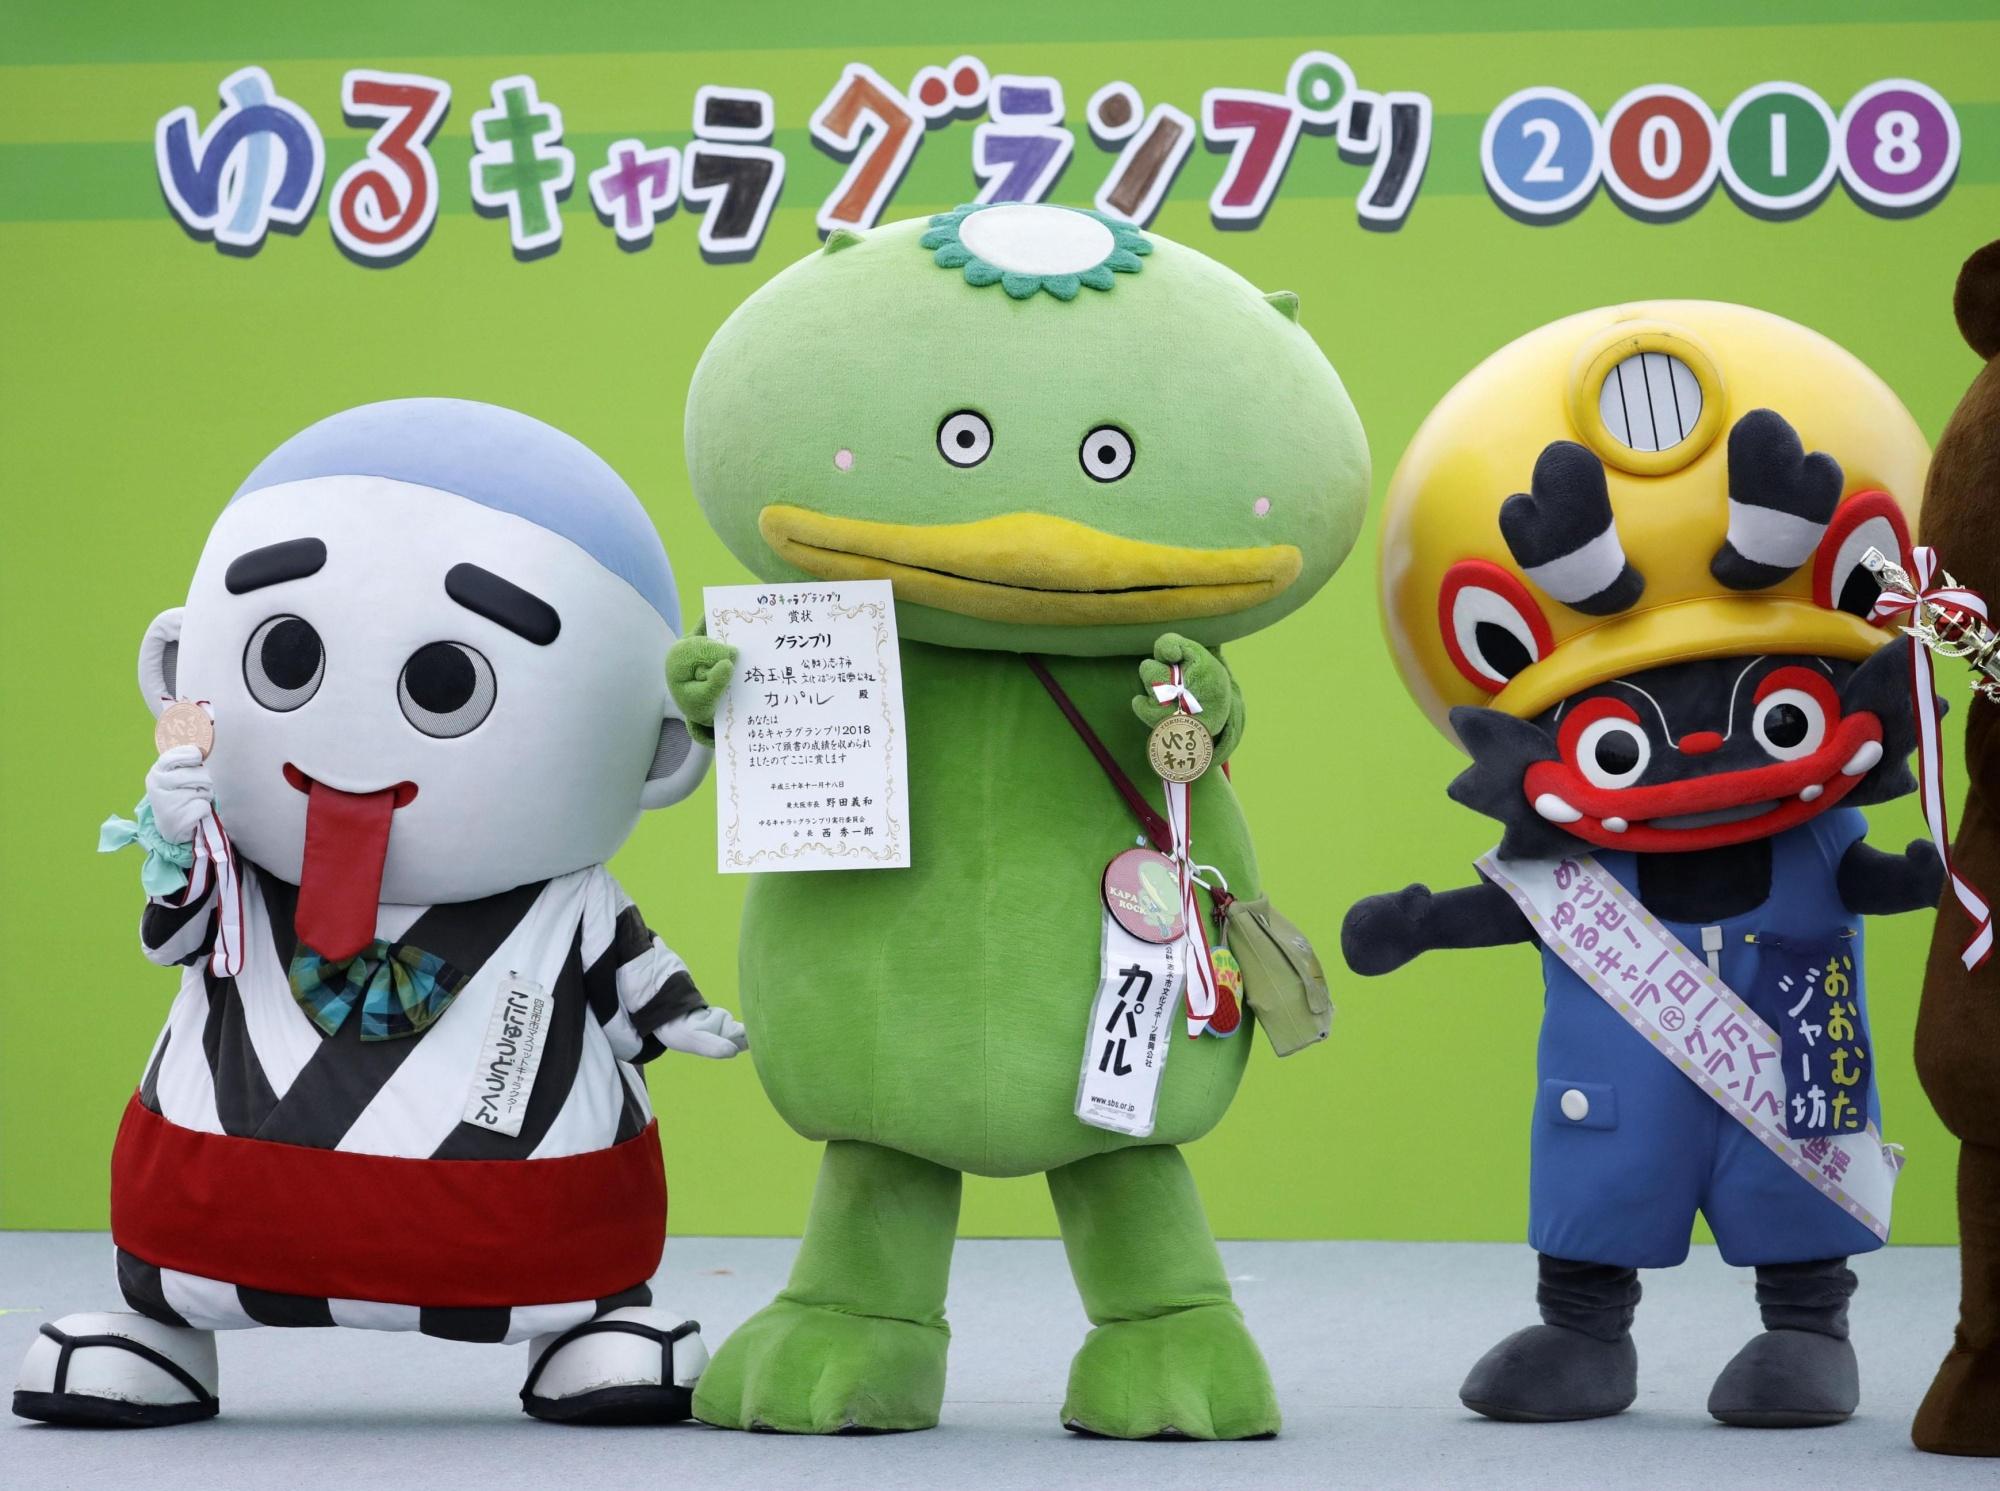 From left: Konyudo-kun, Kaparu, and Jabow.